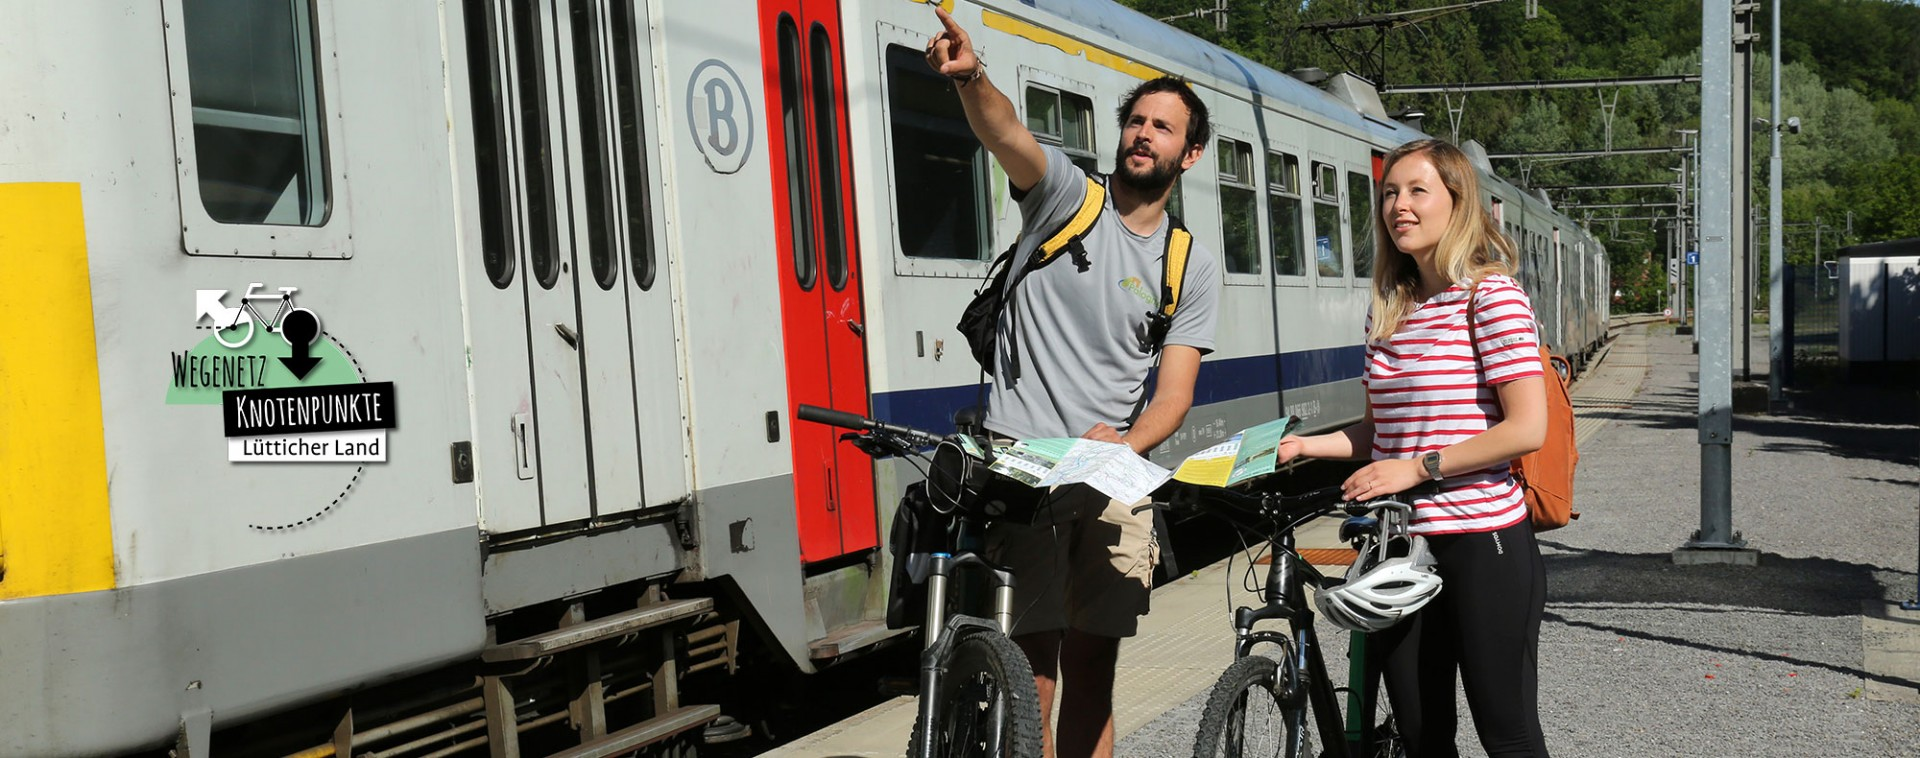 Fahrrad–Zug & Landschaften | © FTPL-Patrice Fagnoul